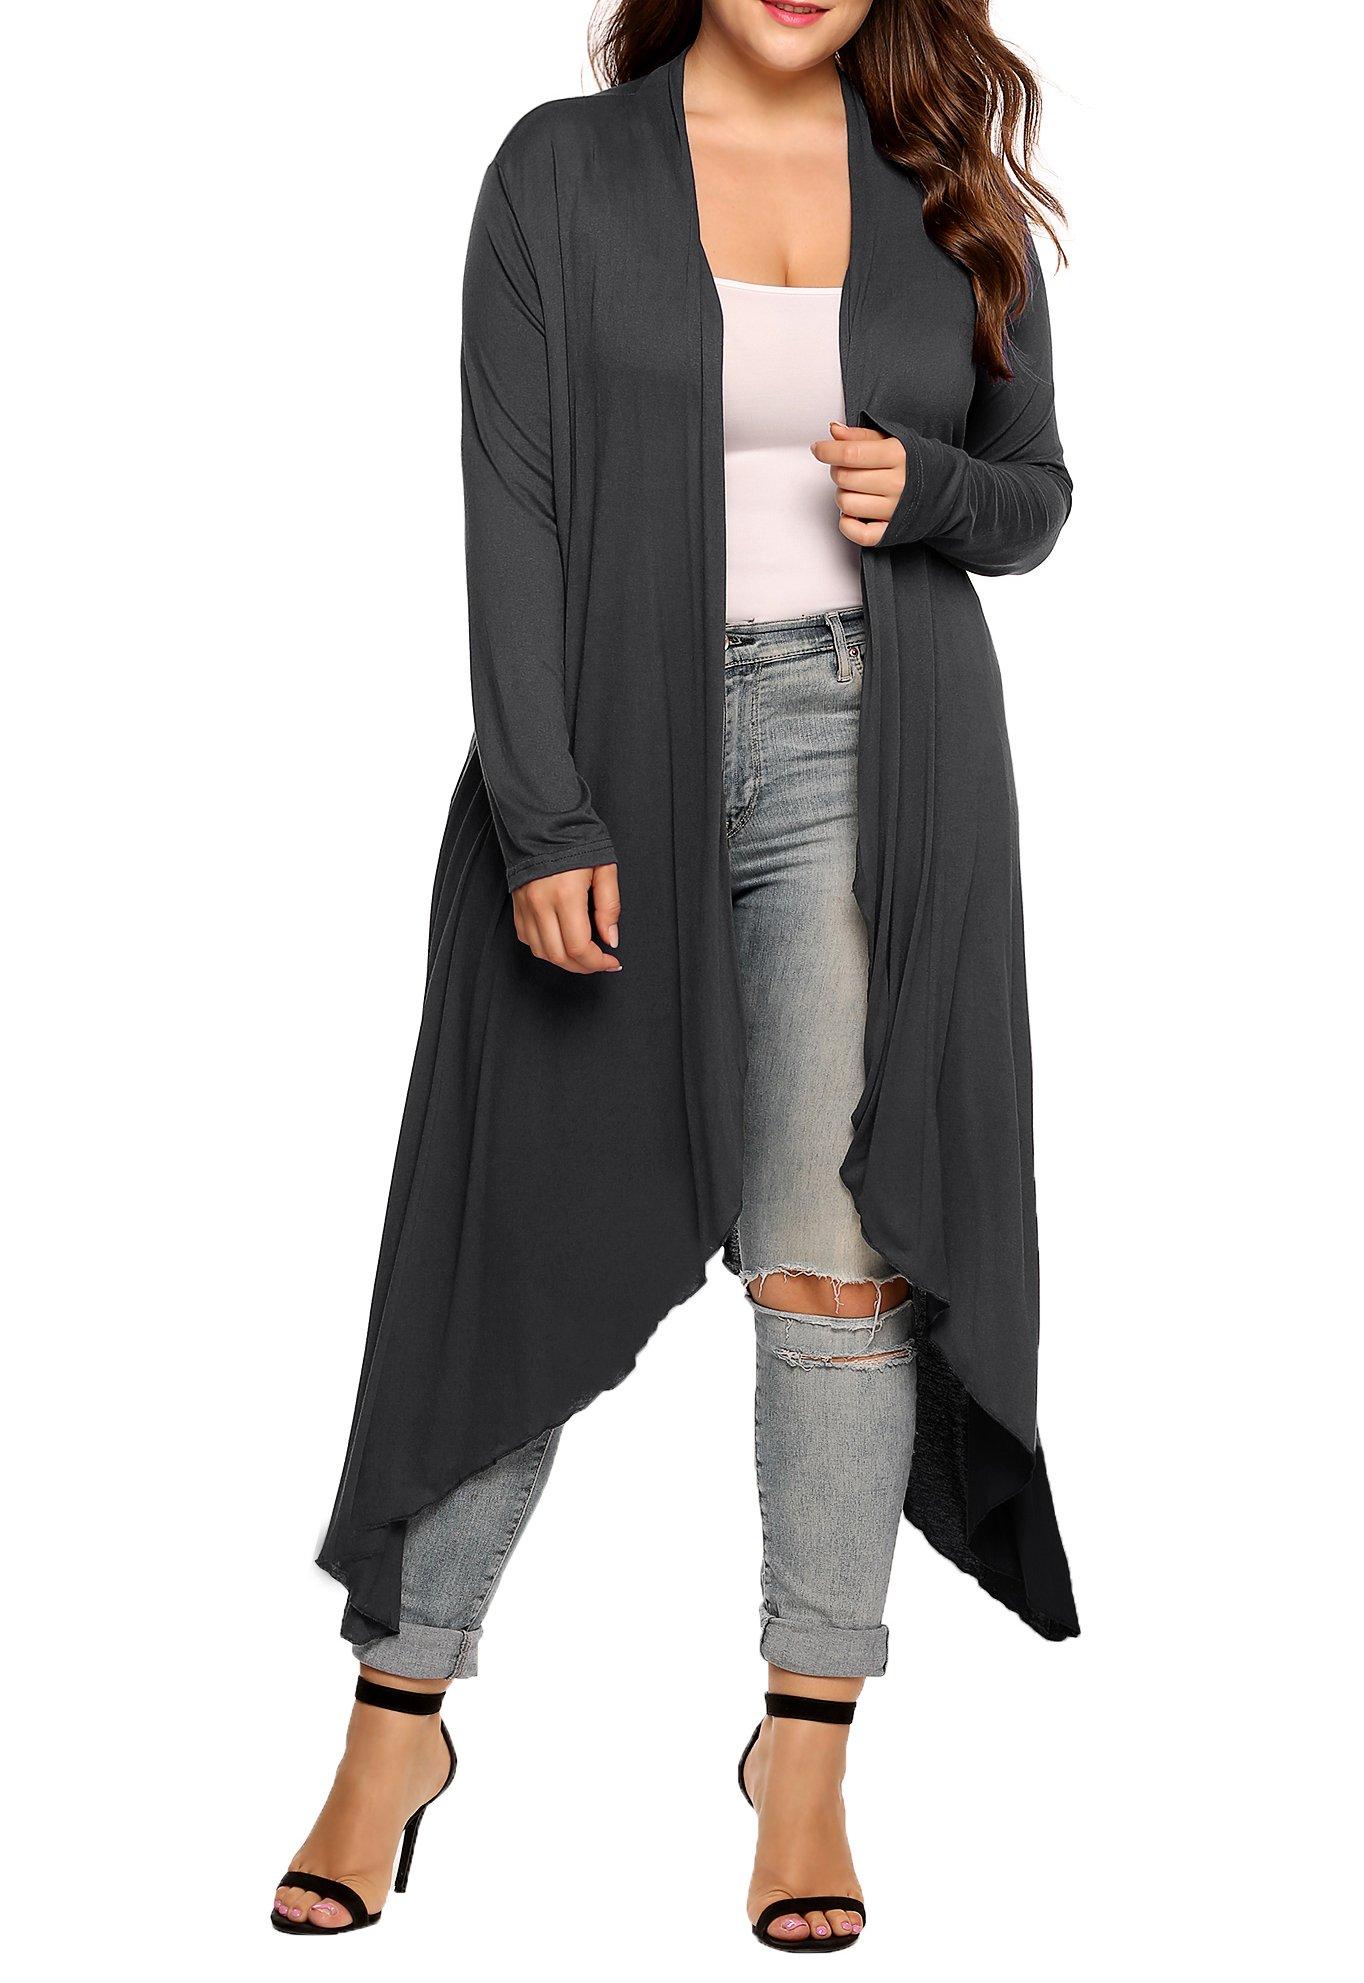 IN'VOLAND Women's Plus Szie Long Sleeve Waterfall Asymmetric Drape Open Long Maxi Cardigan (XXXL, Gray)